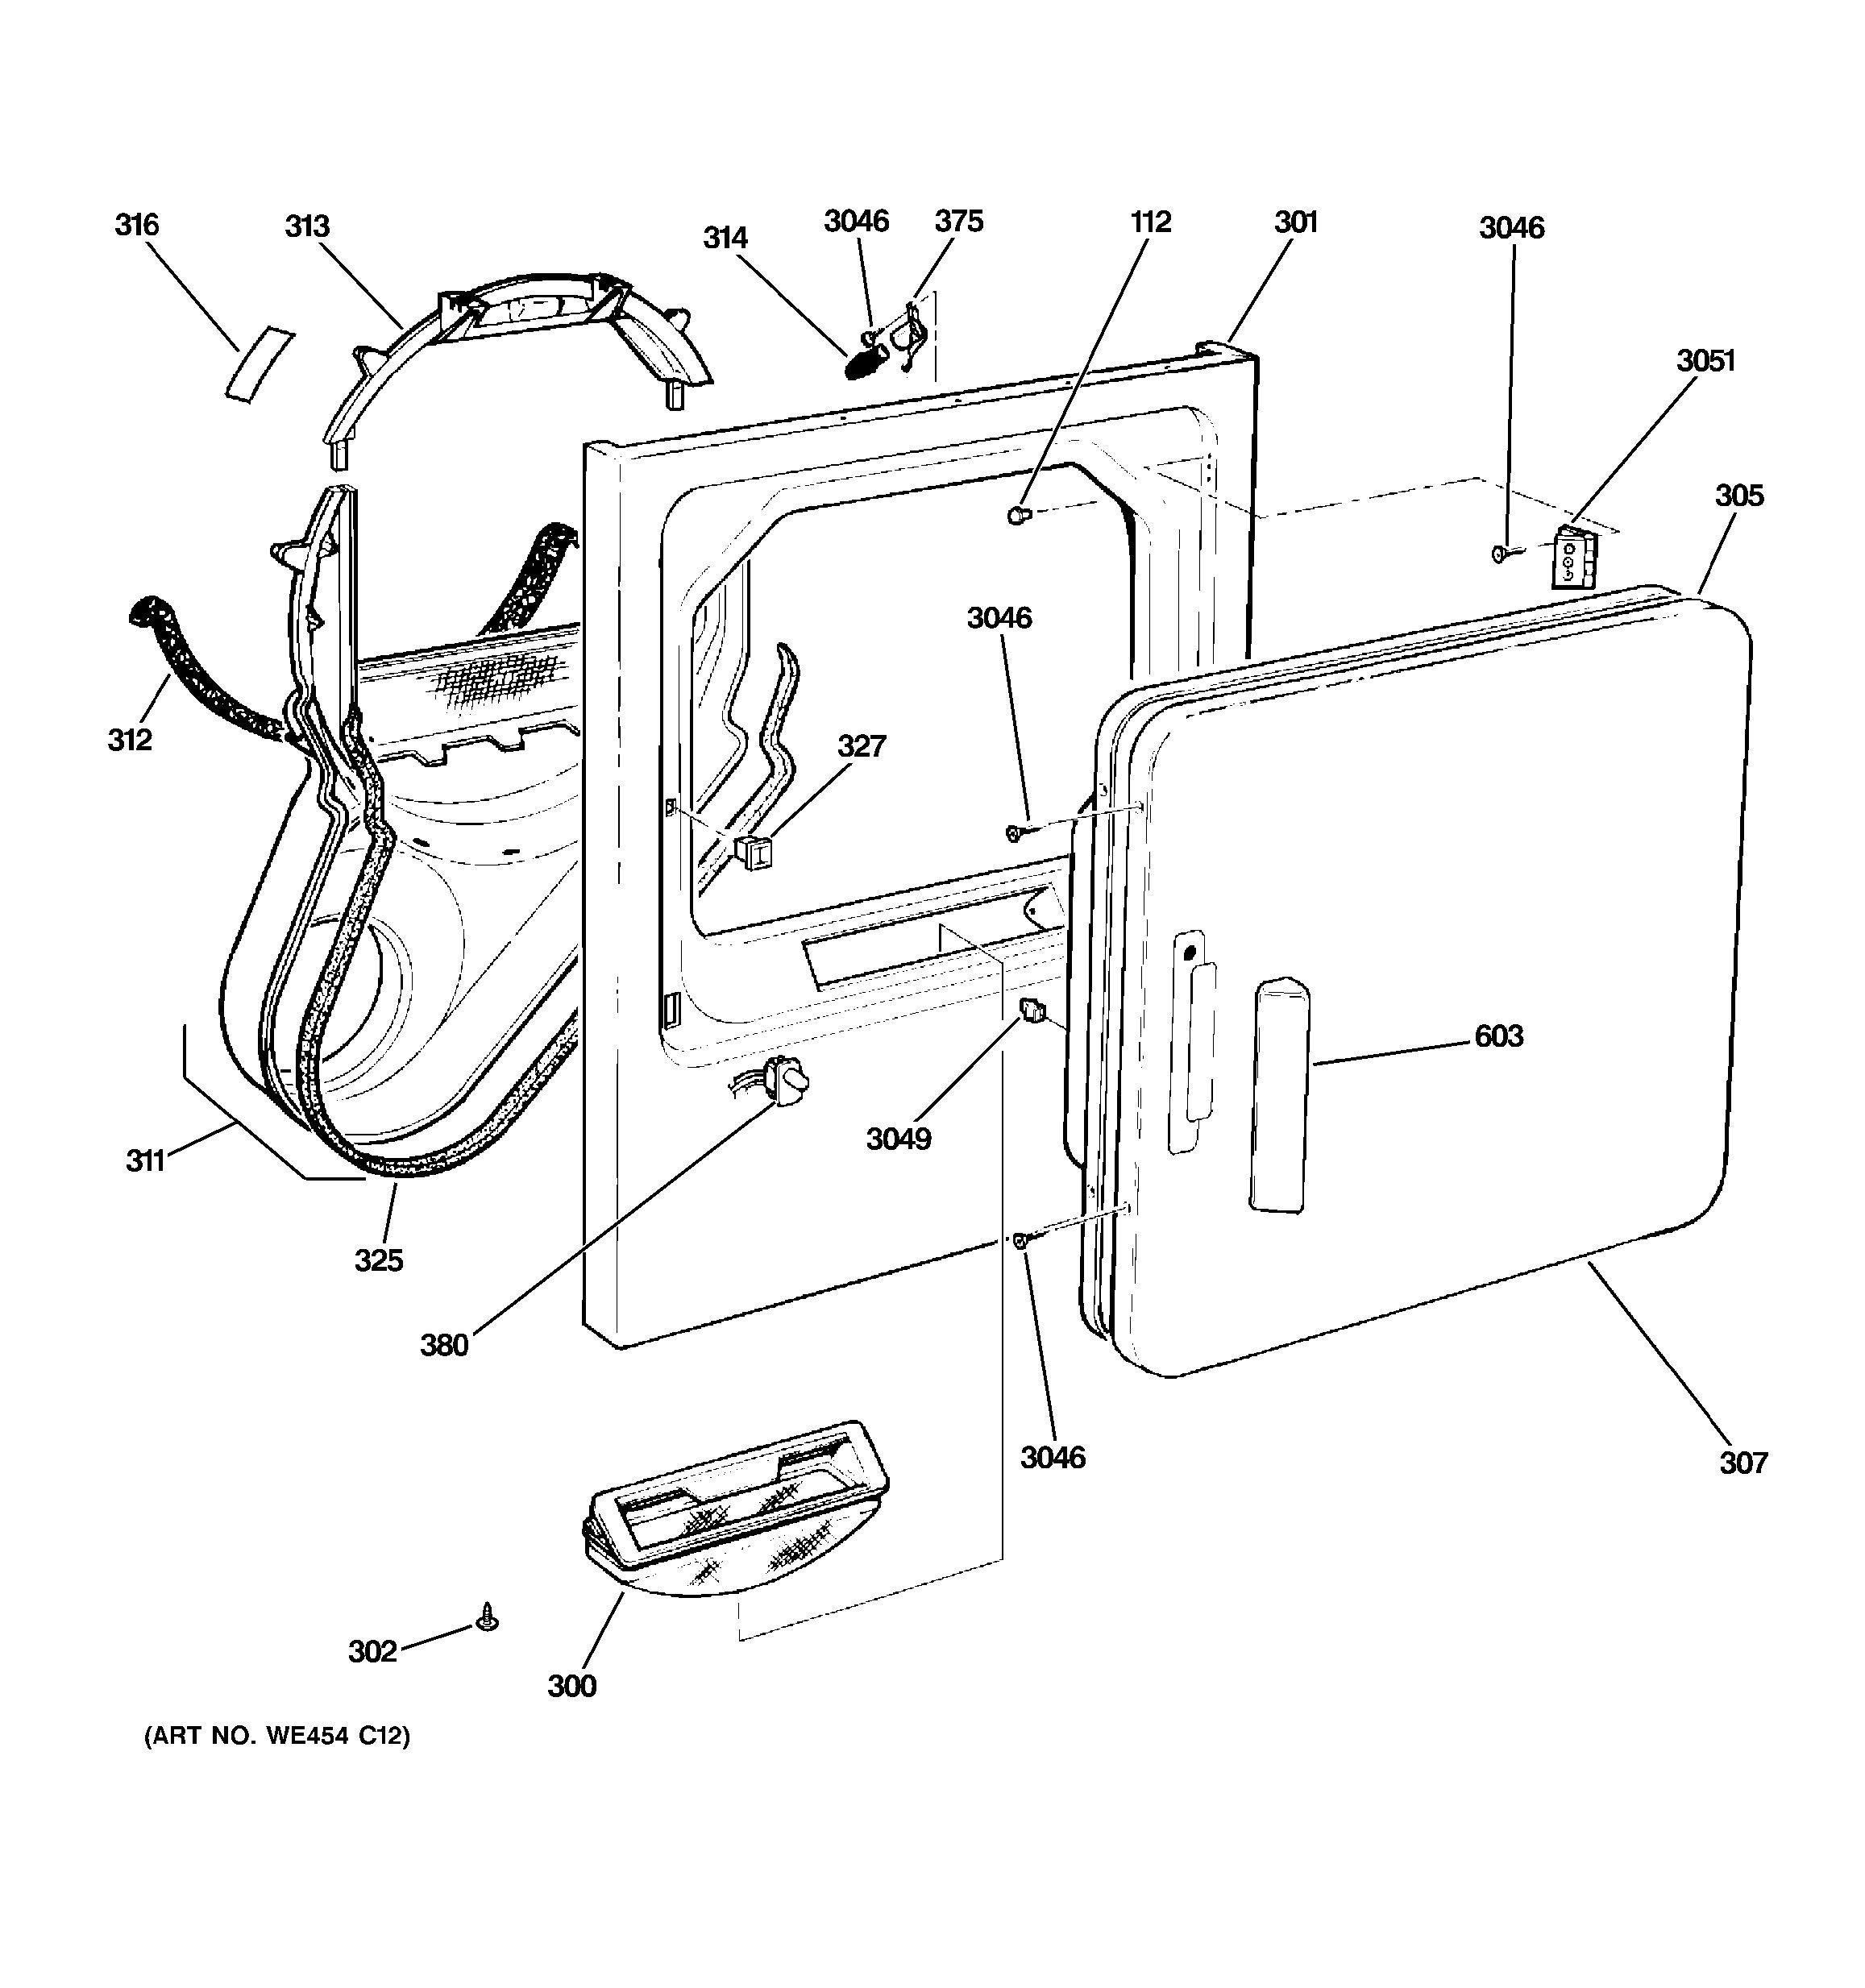 W211 Front Fuse Box Diagram